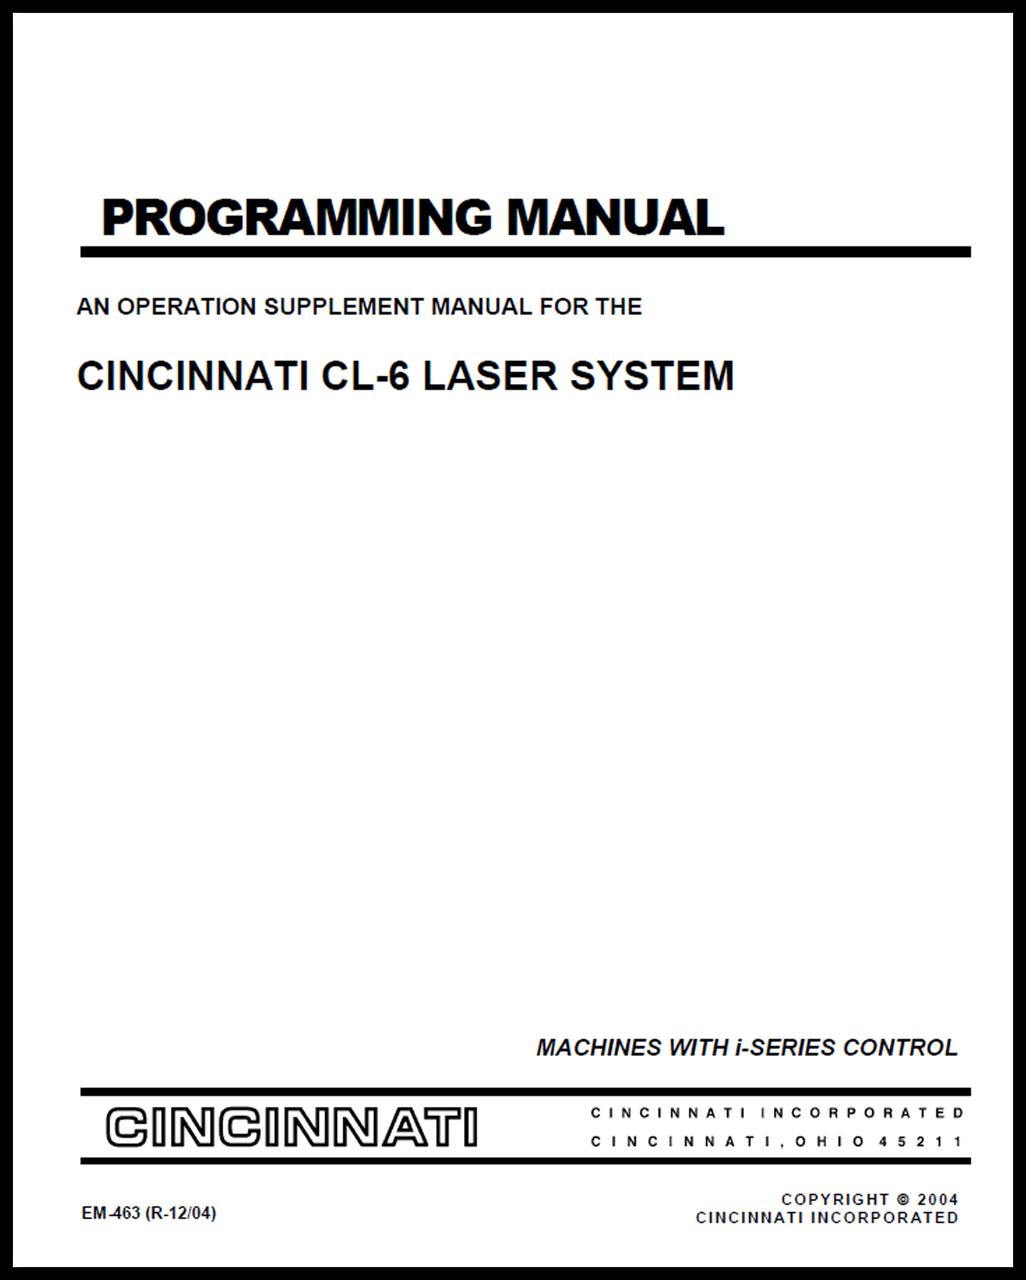 EM-463 (R-12-04) Programming Manual - An Operation Supplement